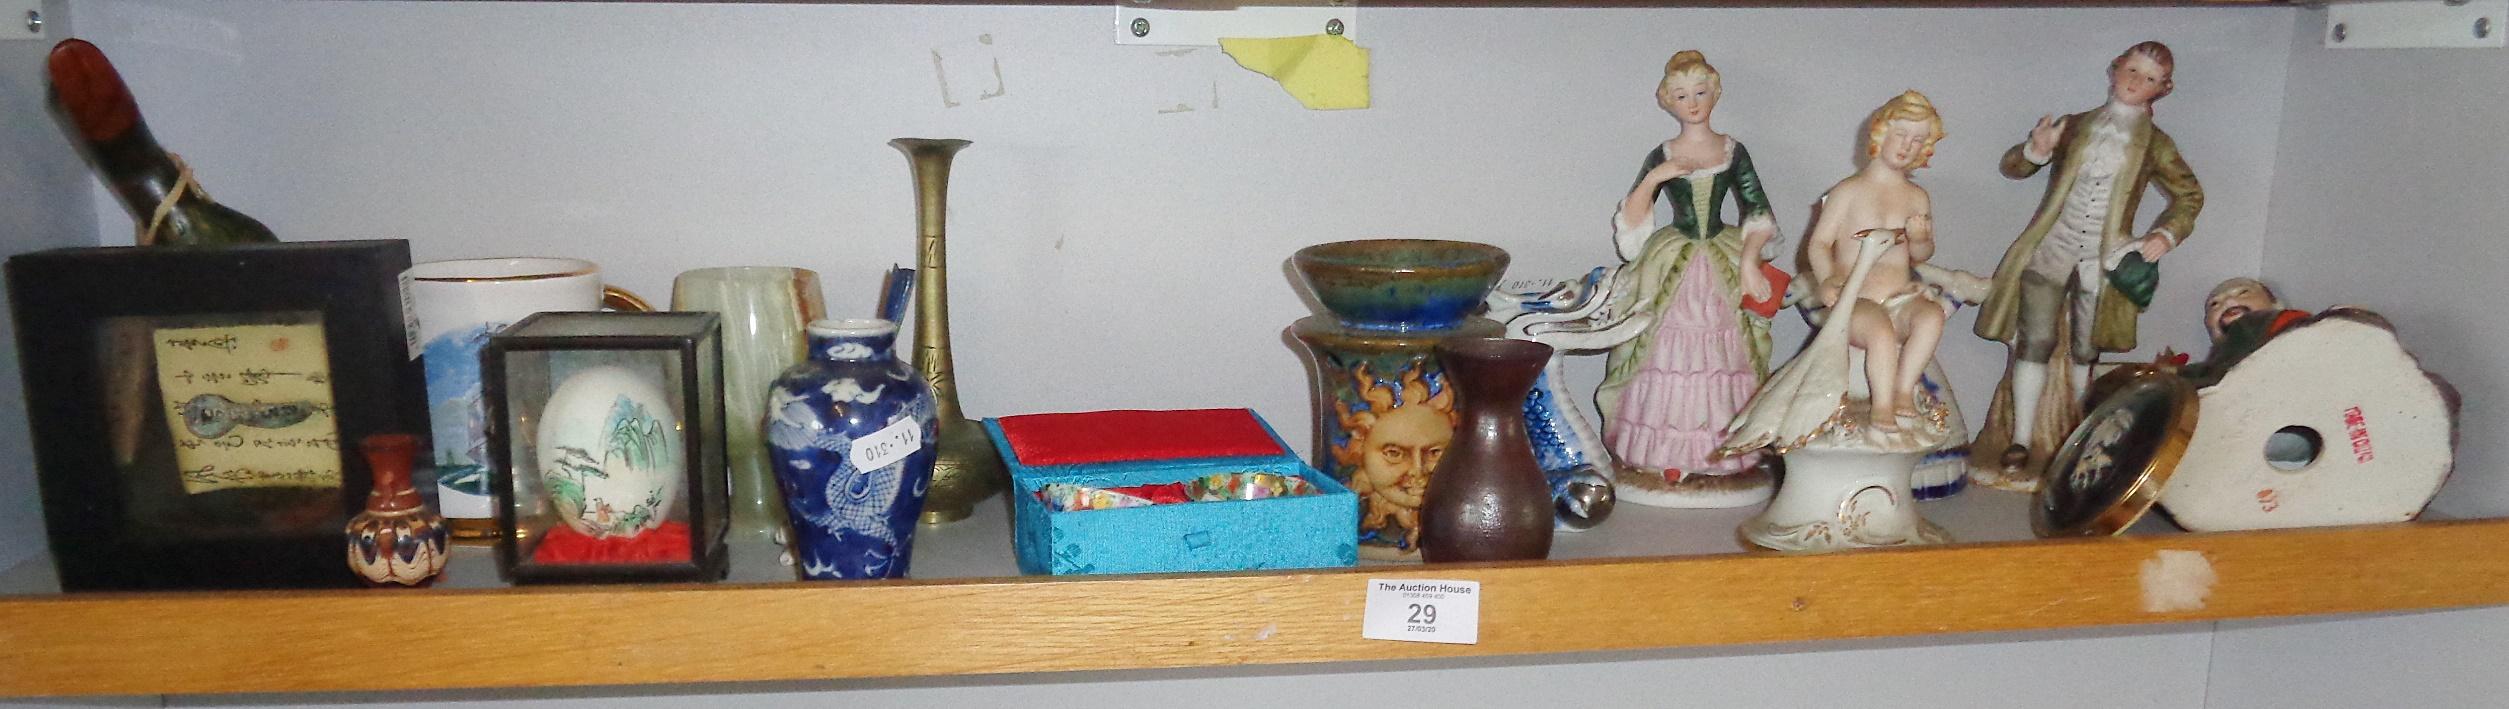 Lot 29 - Assorted china ornaments, inc. Oriental